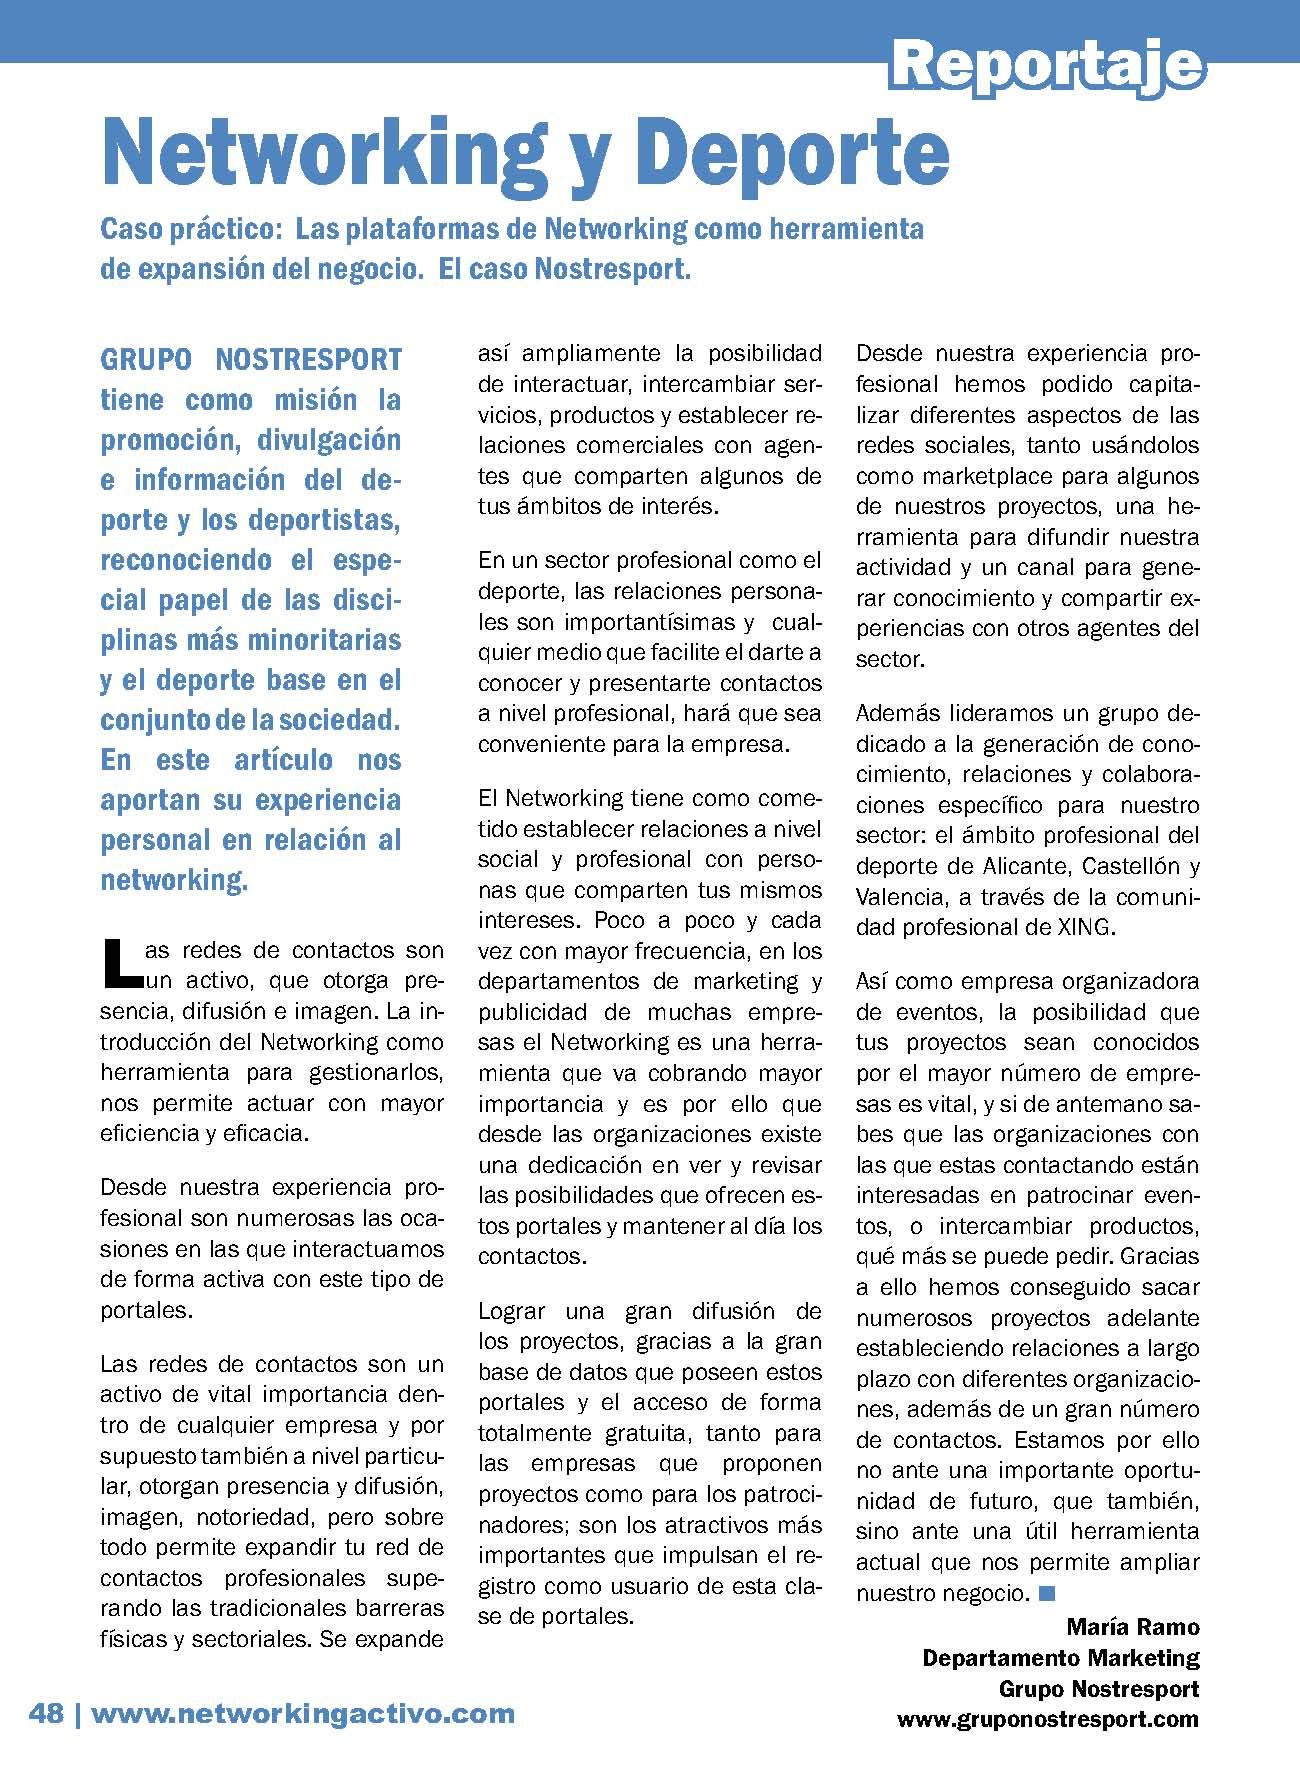 Networking y deporte